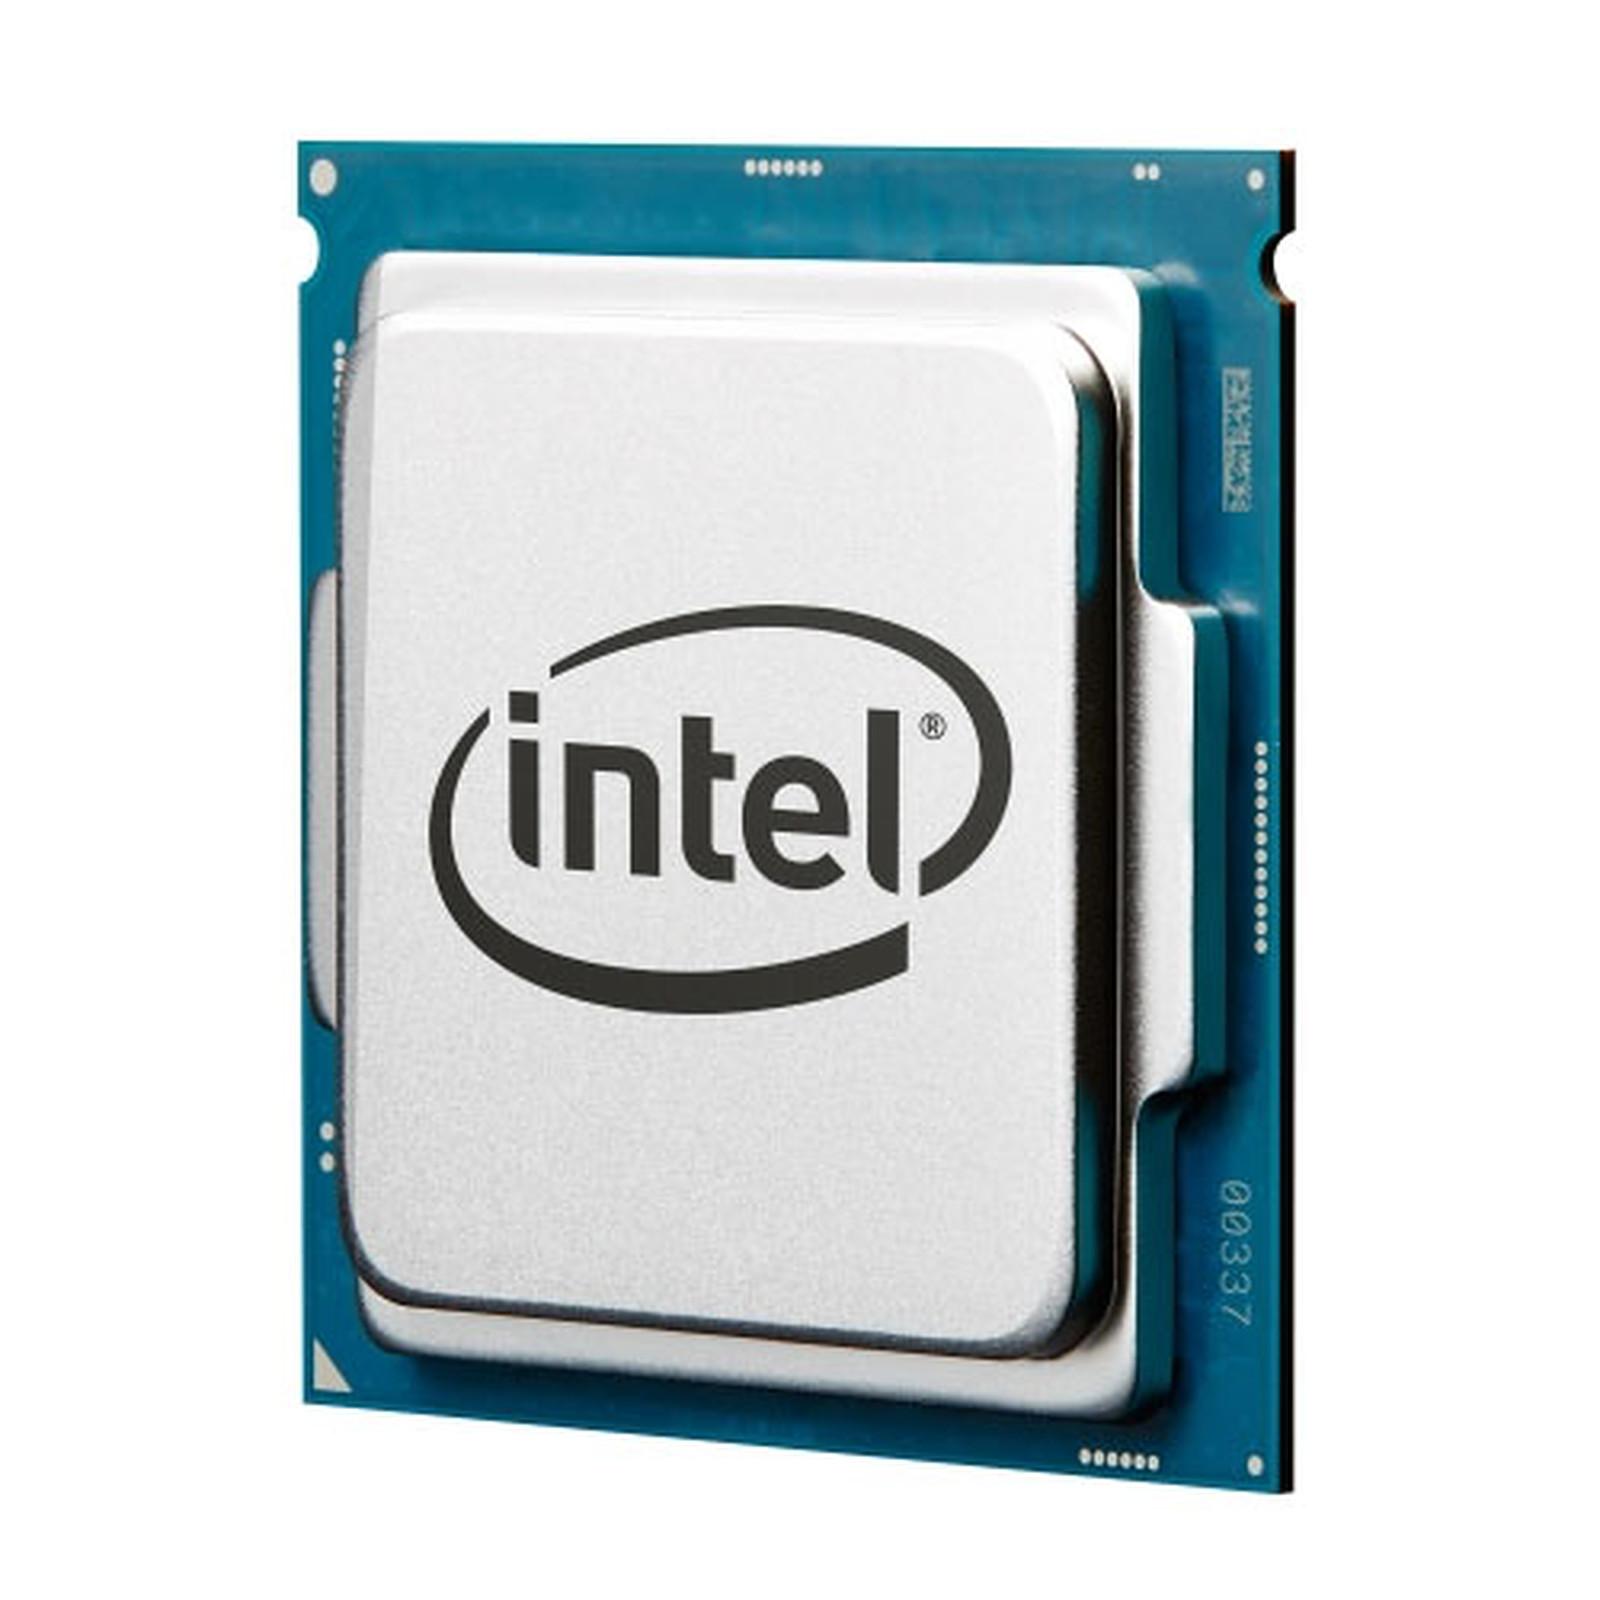 Intel Core I3-2310M (2.1 GHz)